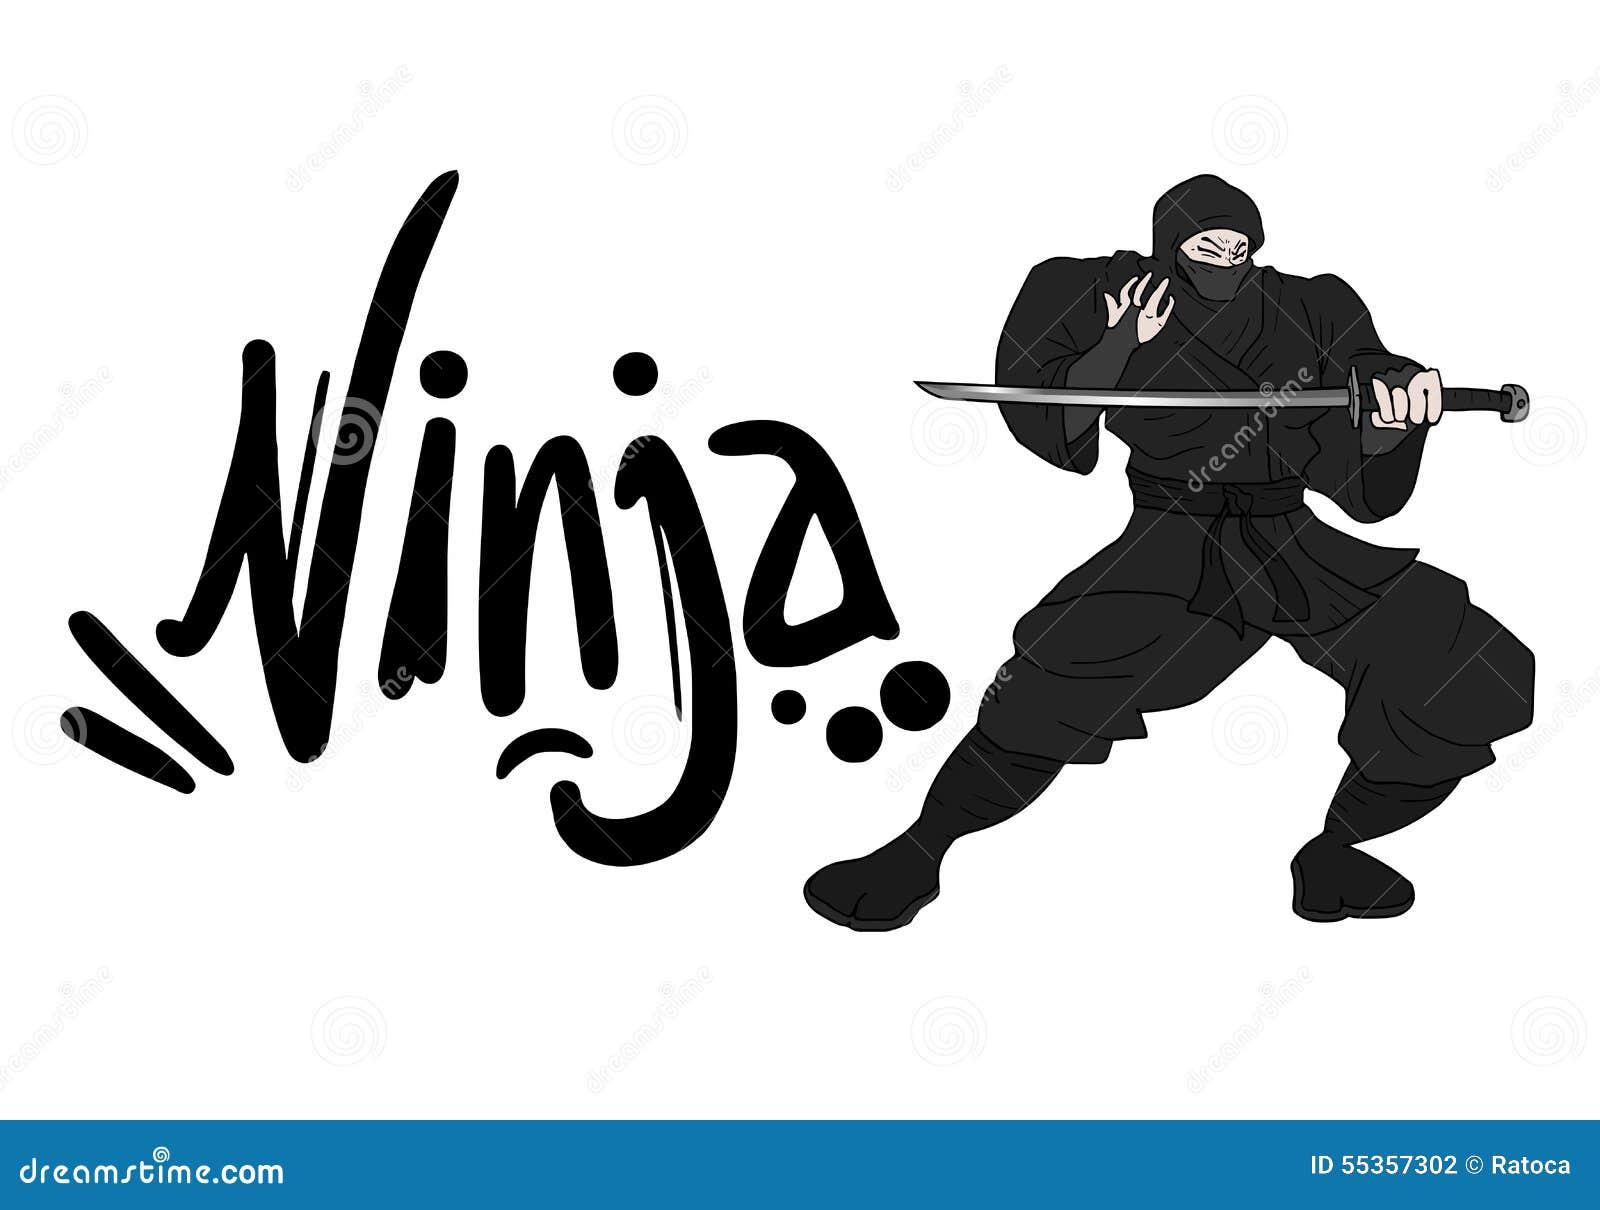 Simbolo di Ninja